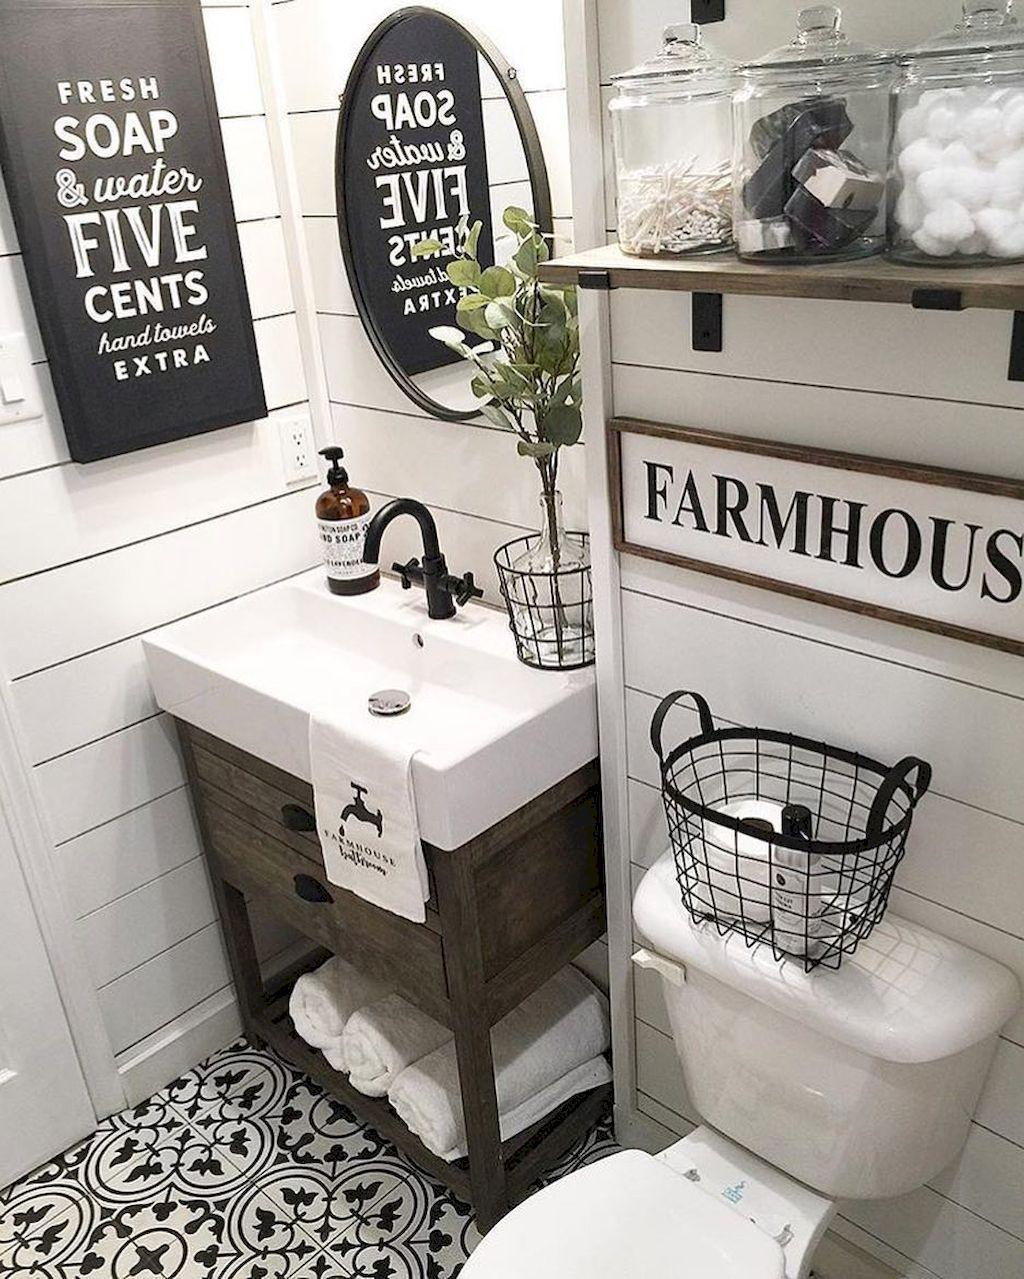 110 Best Farmhouse Bathroom Decor Ideas Dekor Vannoj Peredelka Vannoj Komnaty Rekonstrukciya Vannoj